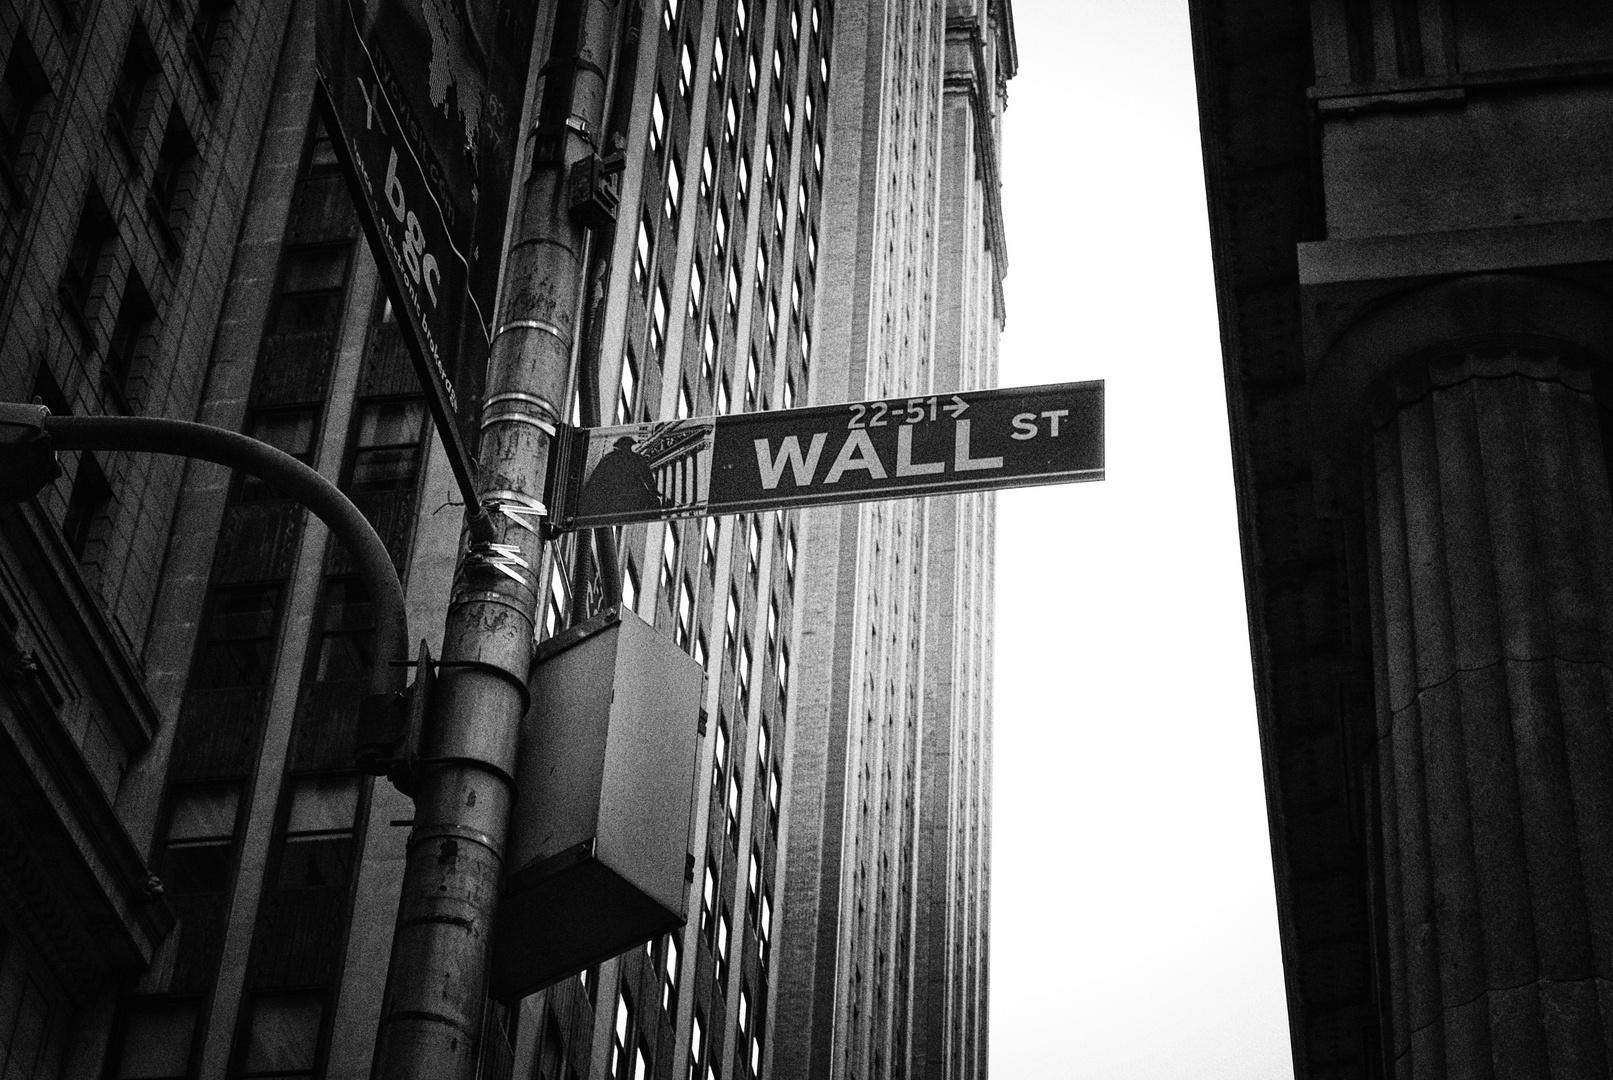 WallStreet_02